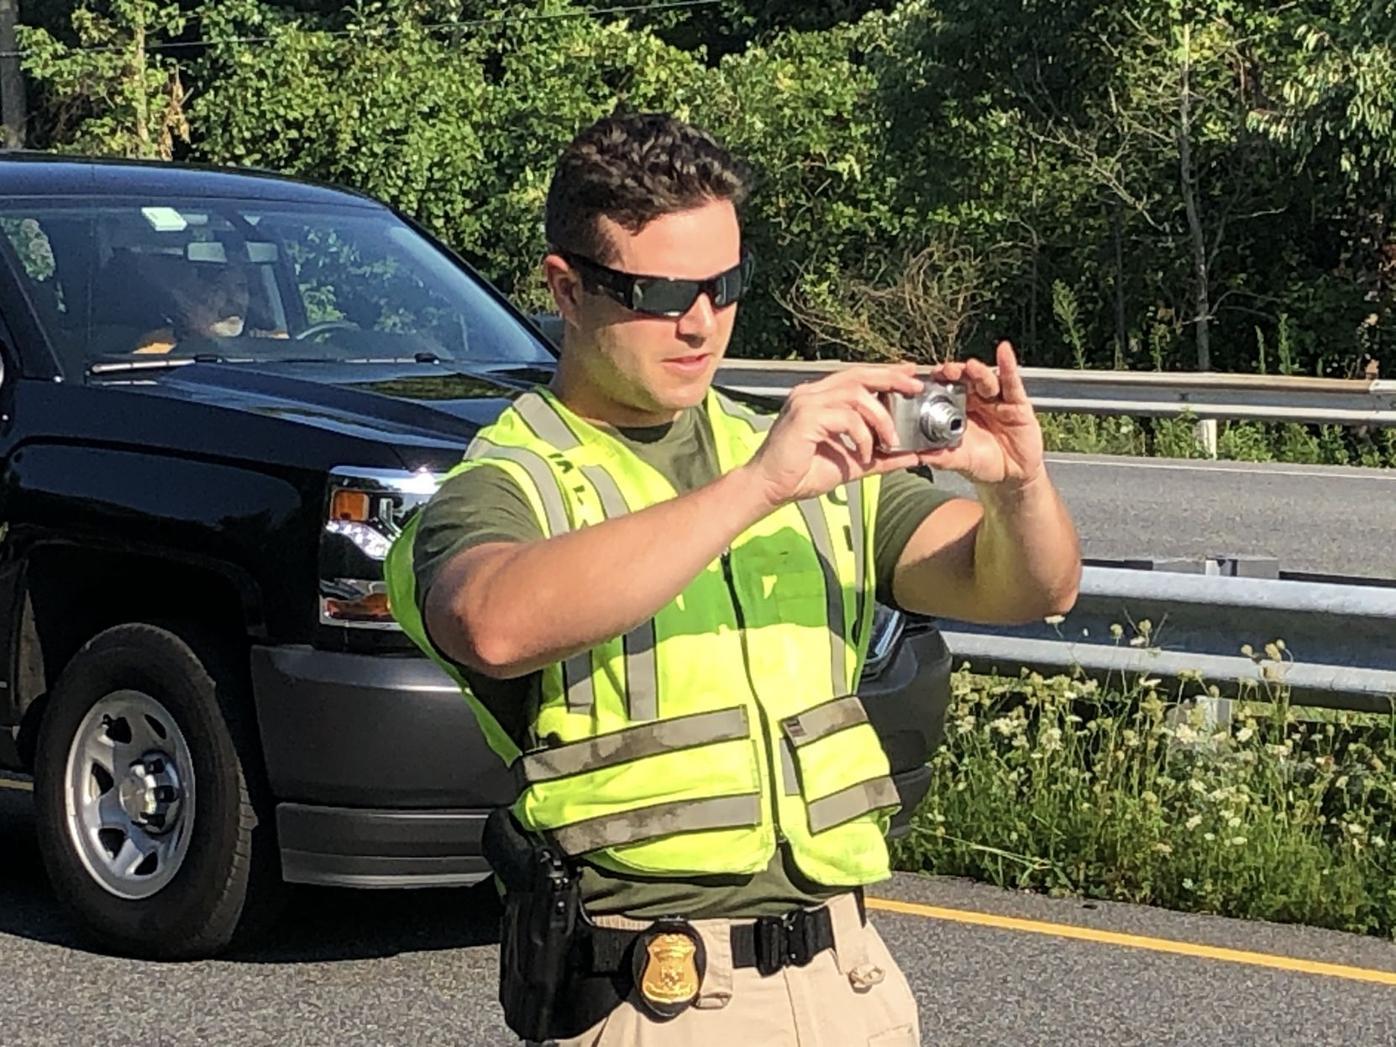 Perryville-area fatal crash